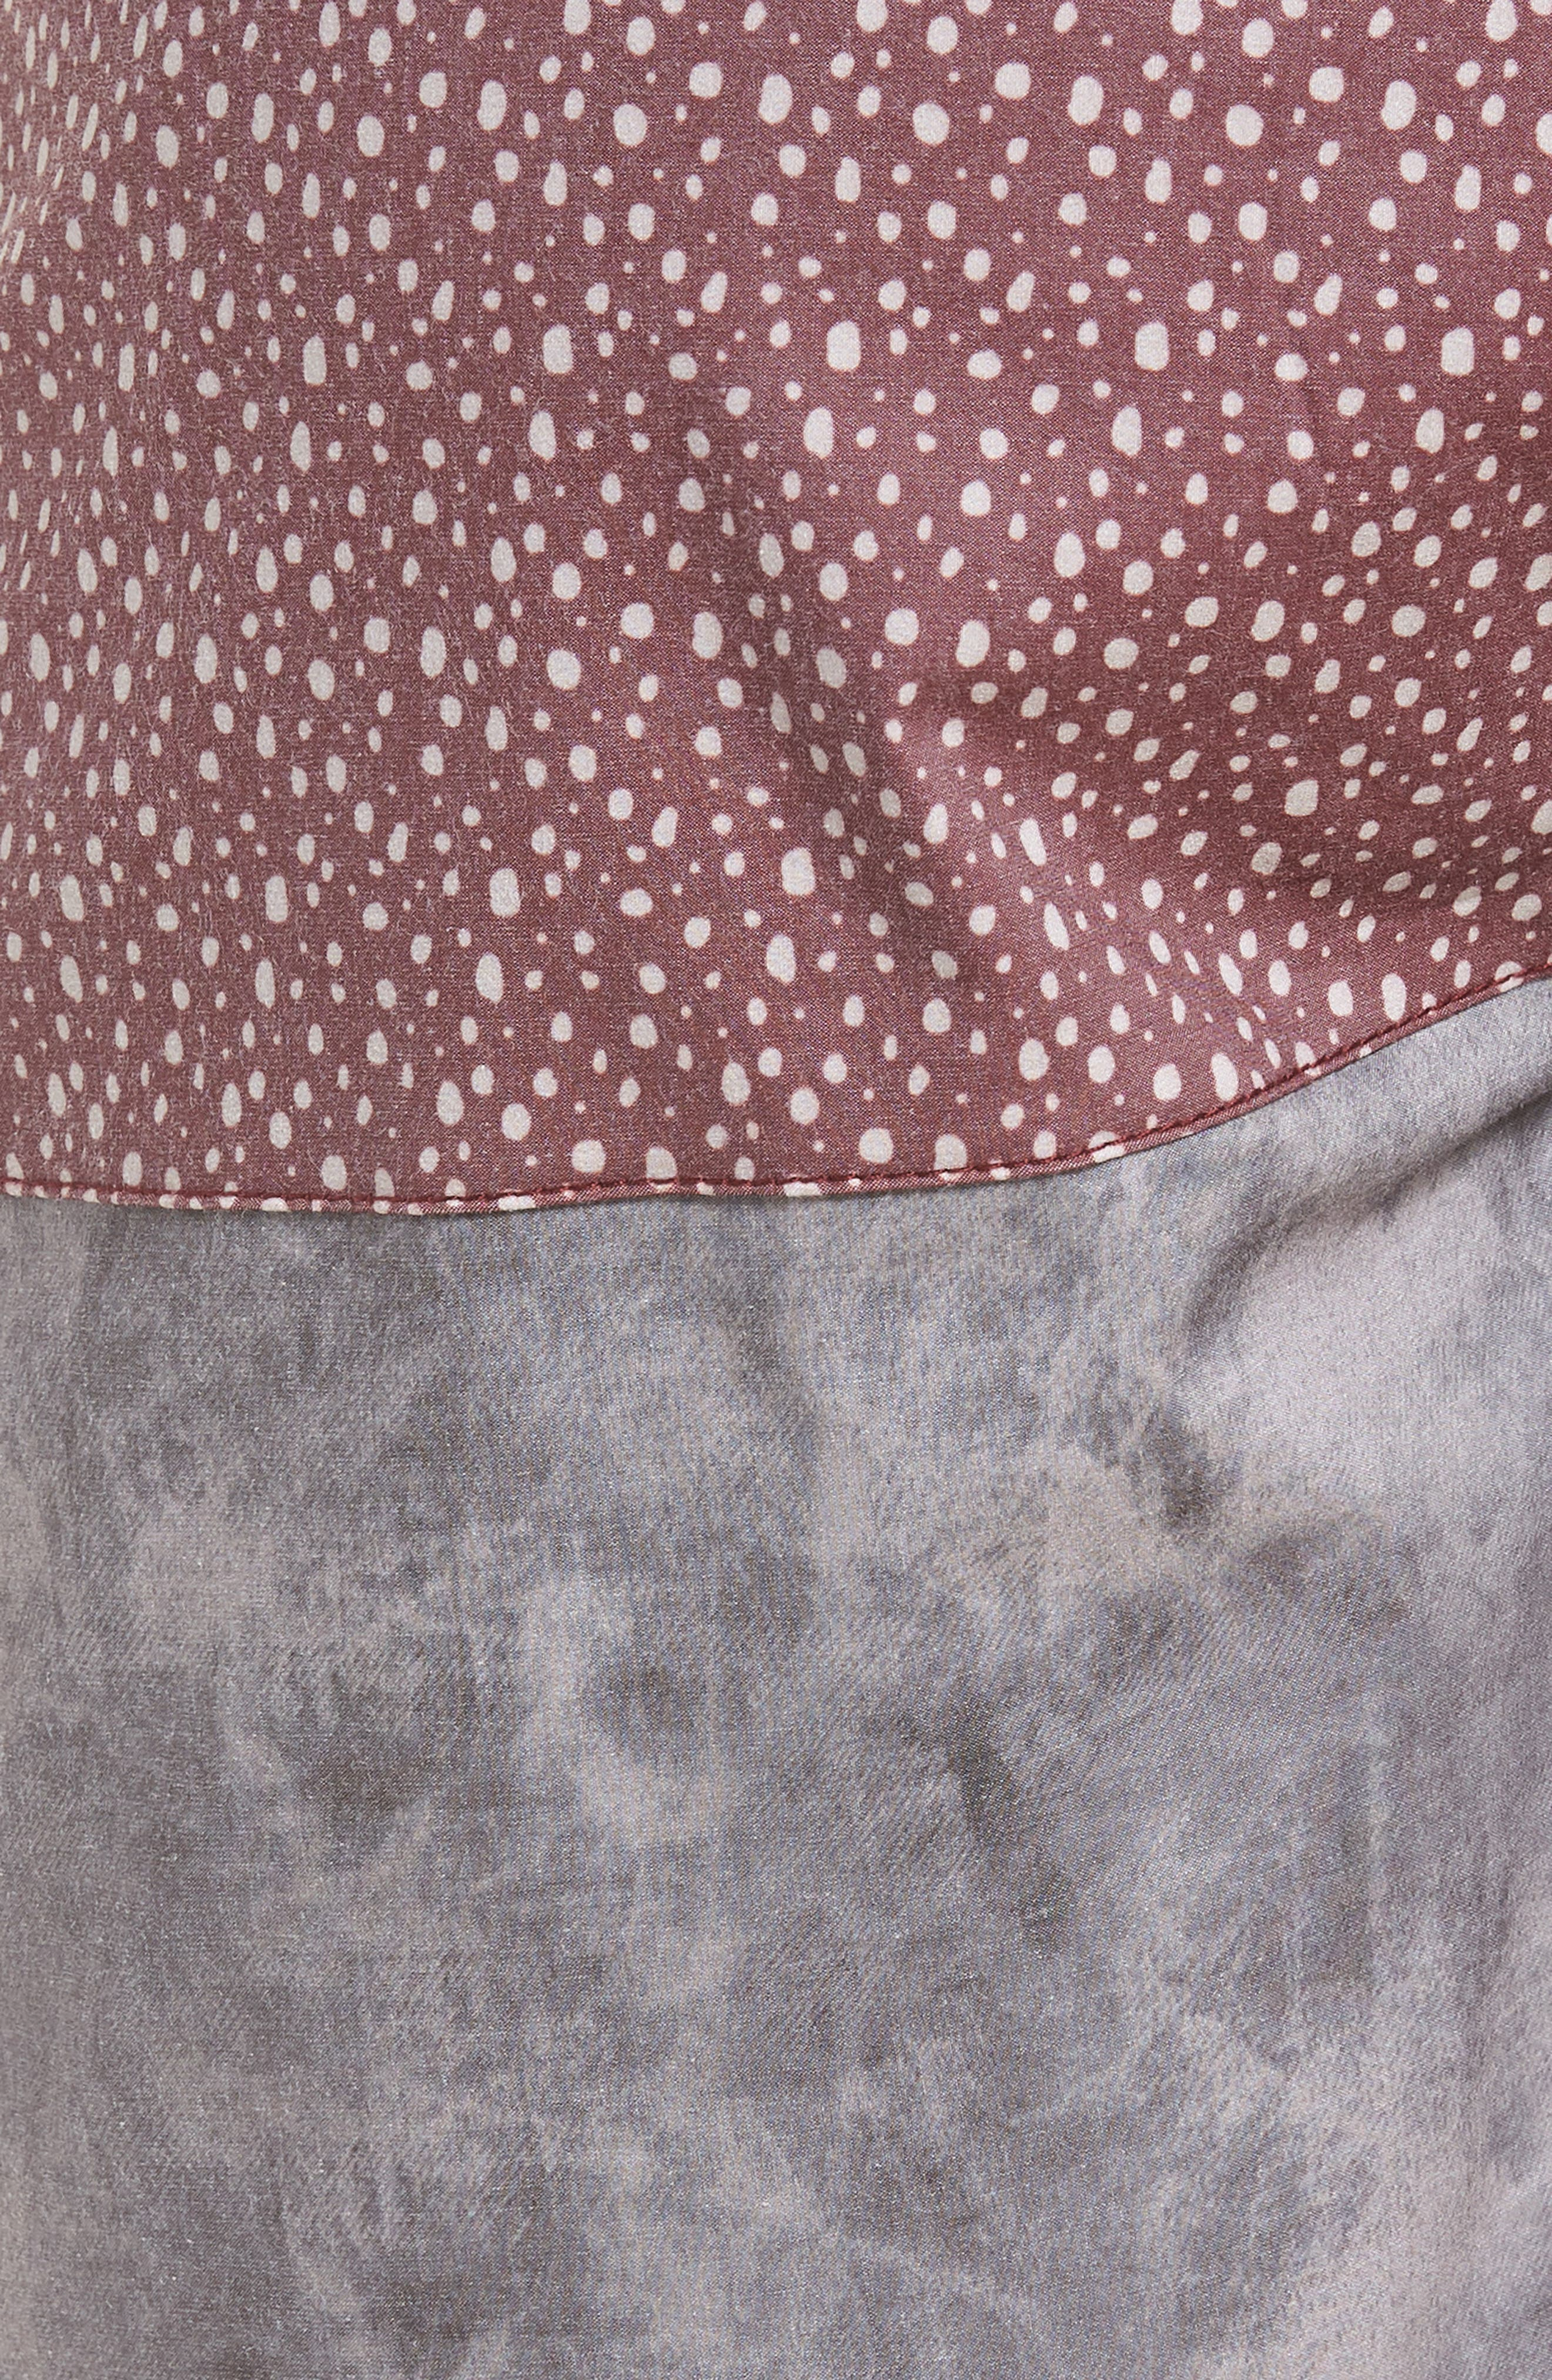 Dotted Swim Shorts,                             Alternate thumbnail 5, color,                             Rust